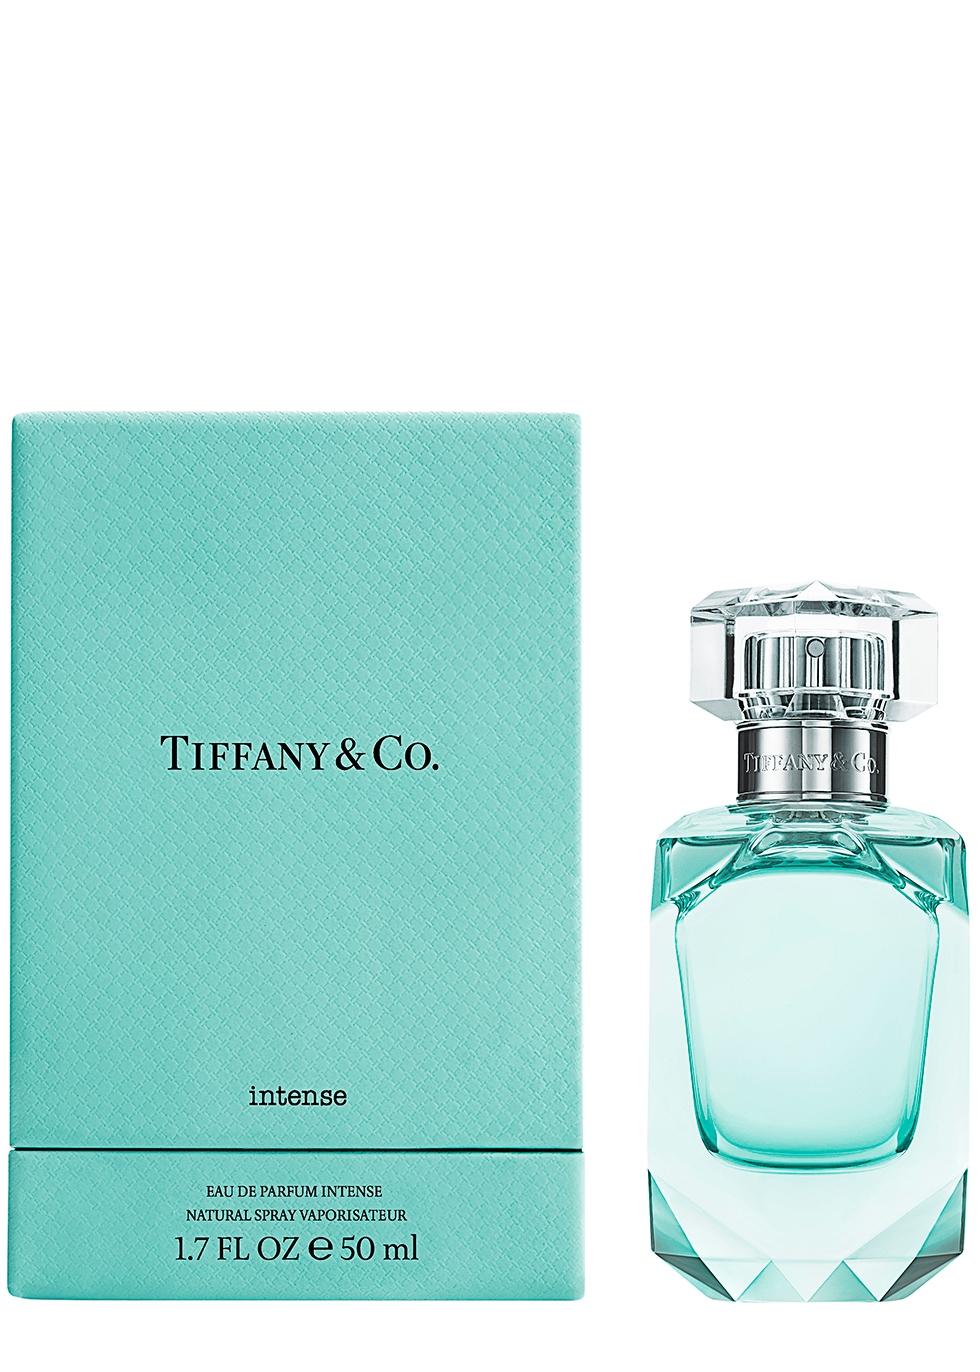 Tiffany Intense Eau De Parfum 50ml - TIFFANY